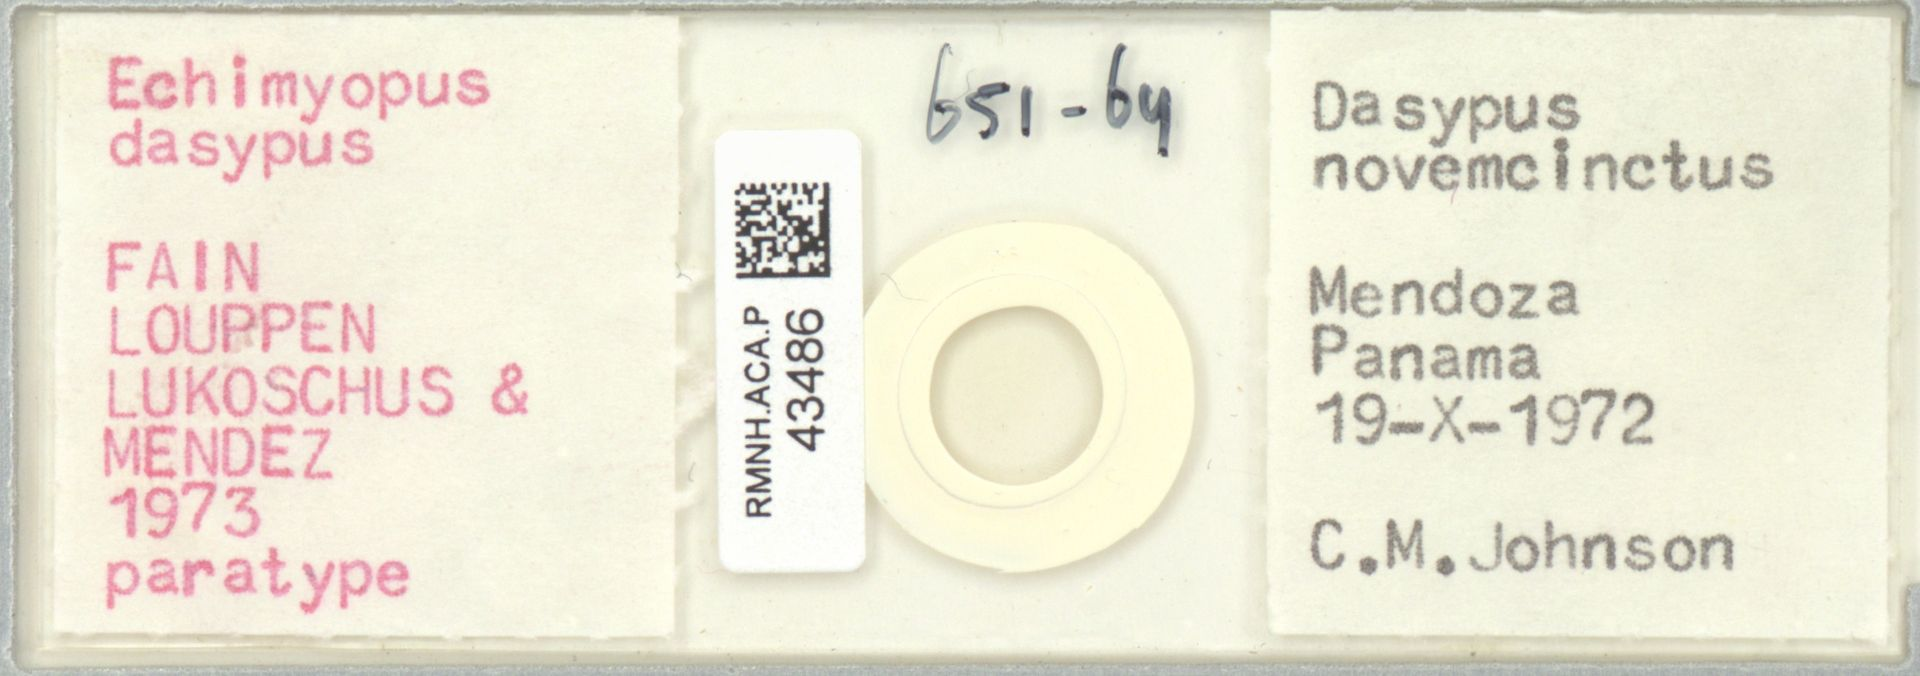 RMNH.ACA.P.43486 | Echimyopus dasypus Fain, Louppen Lukoschus & Mendez 1973